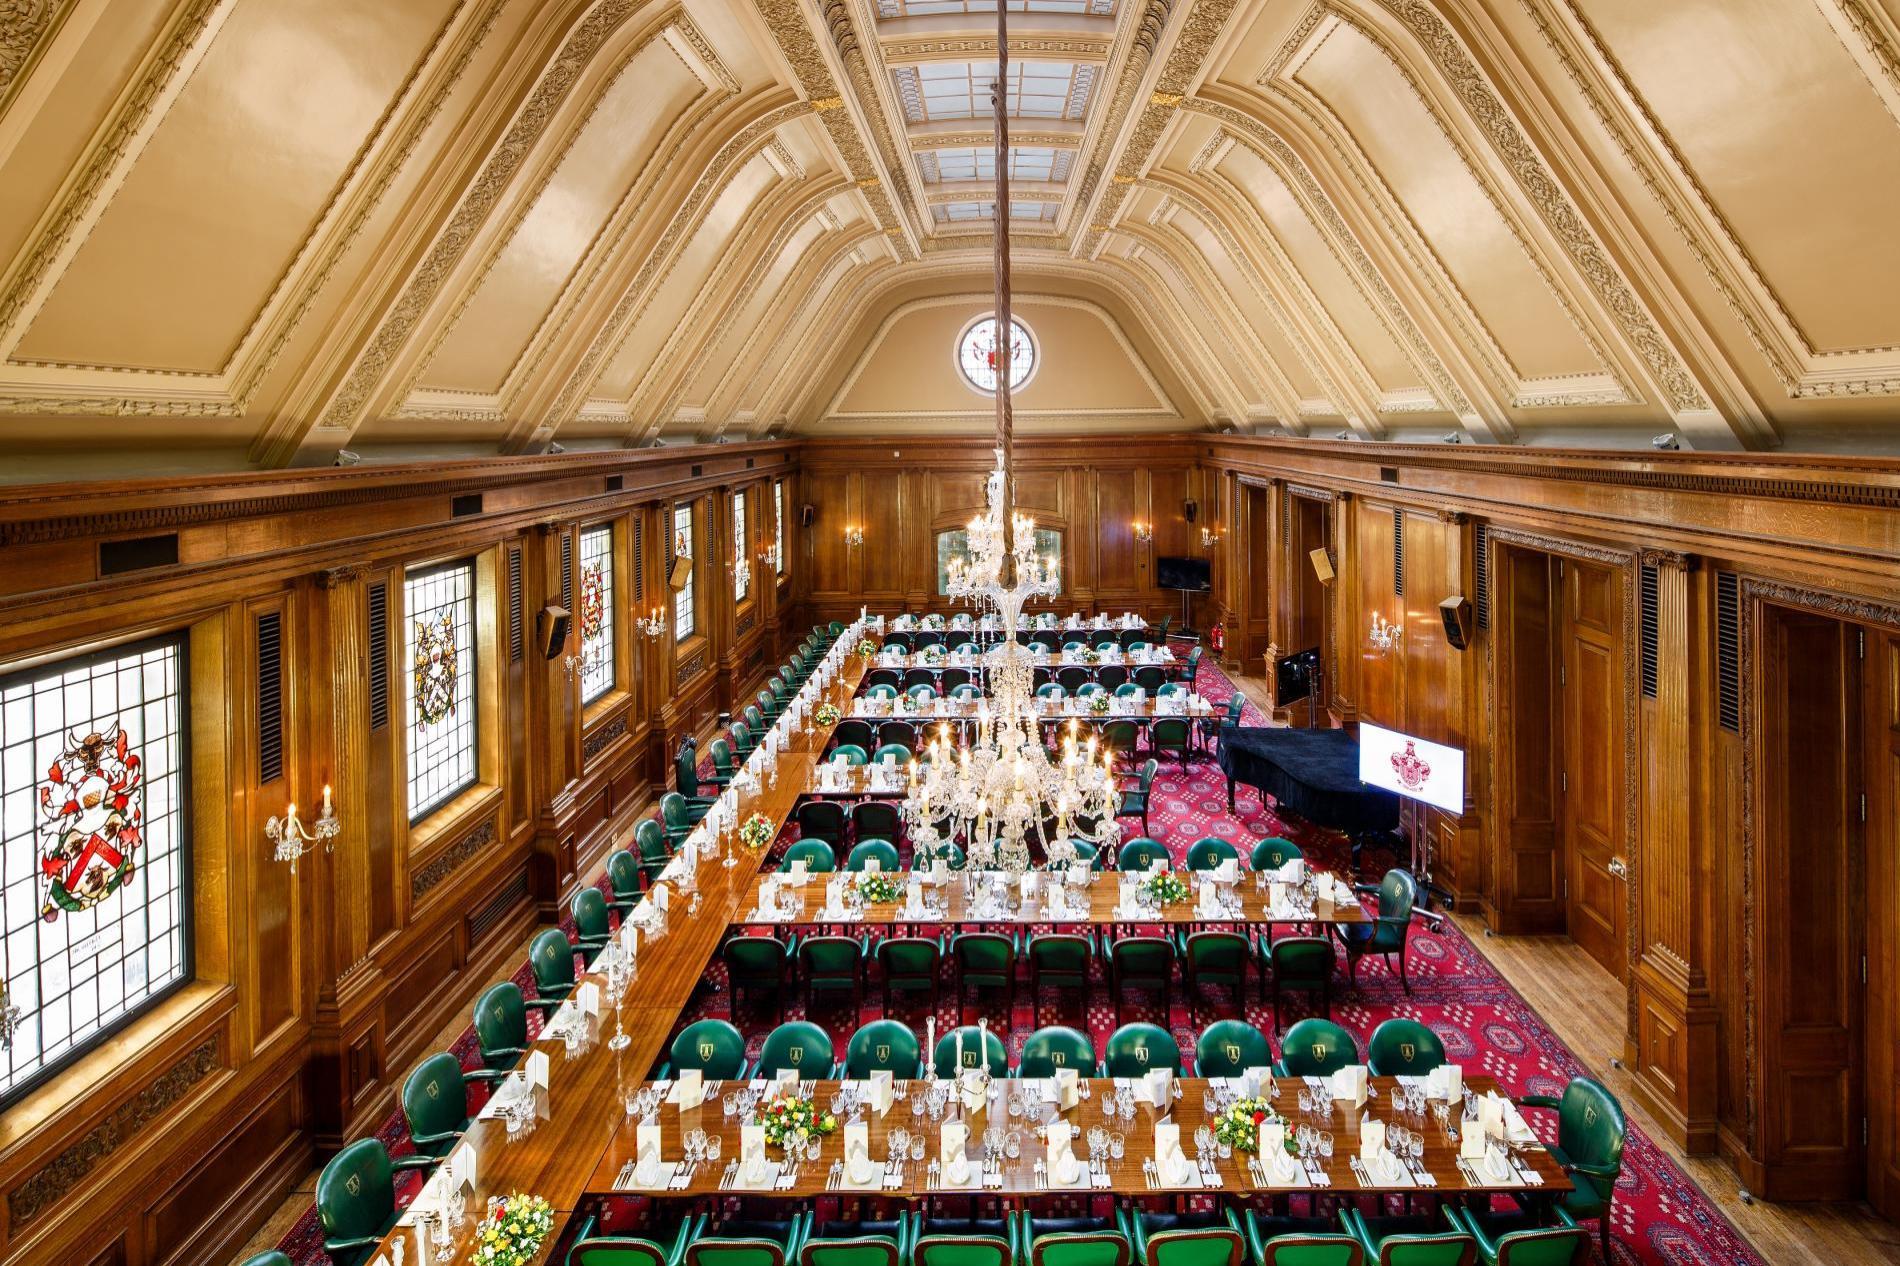 The Livery Hall image